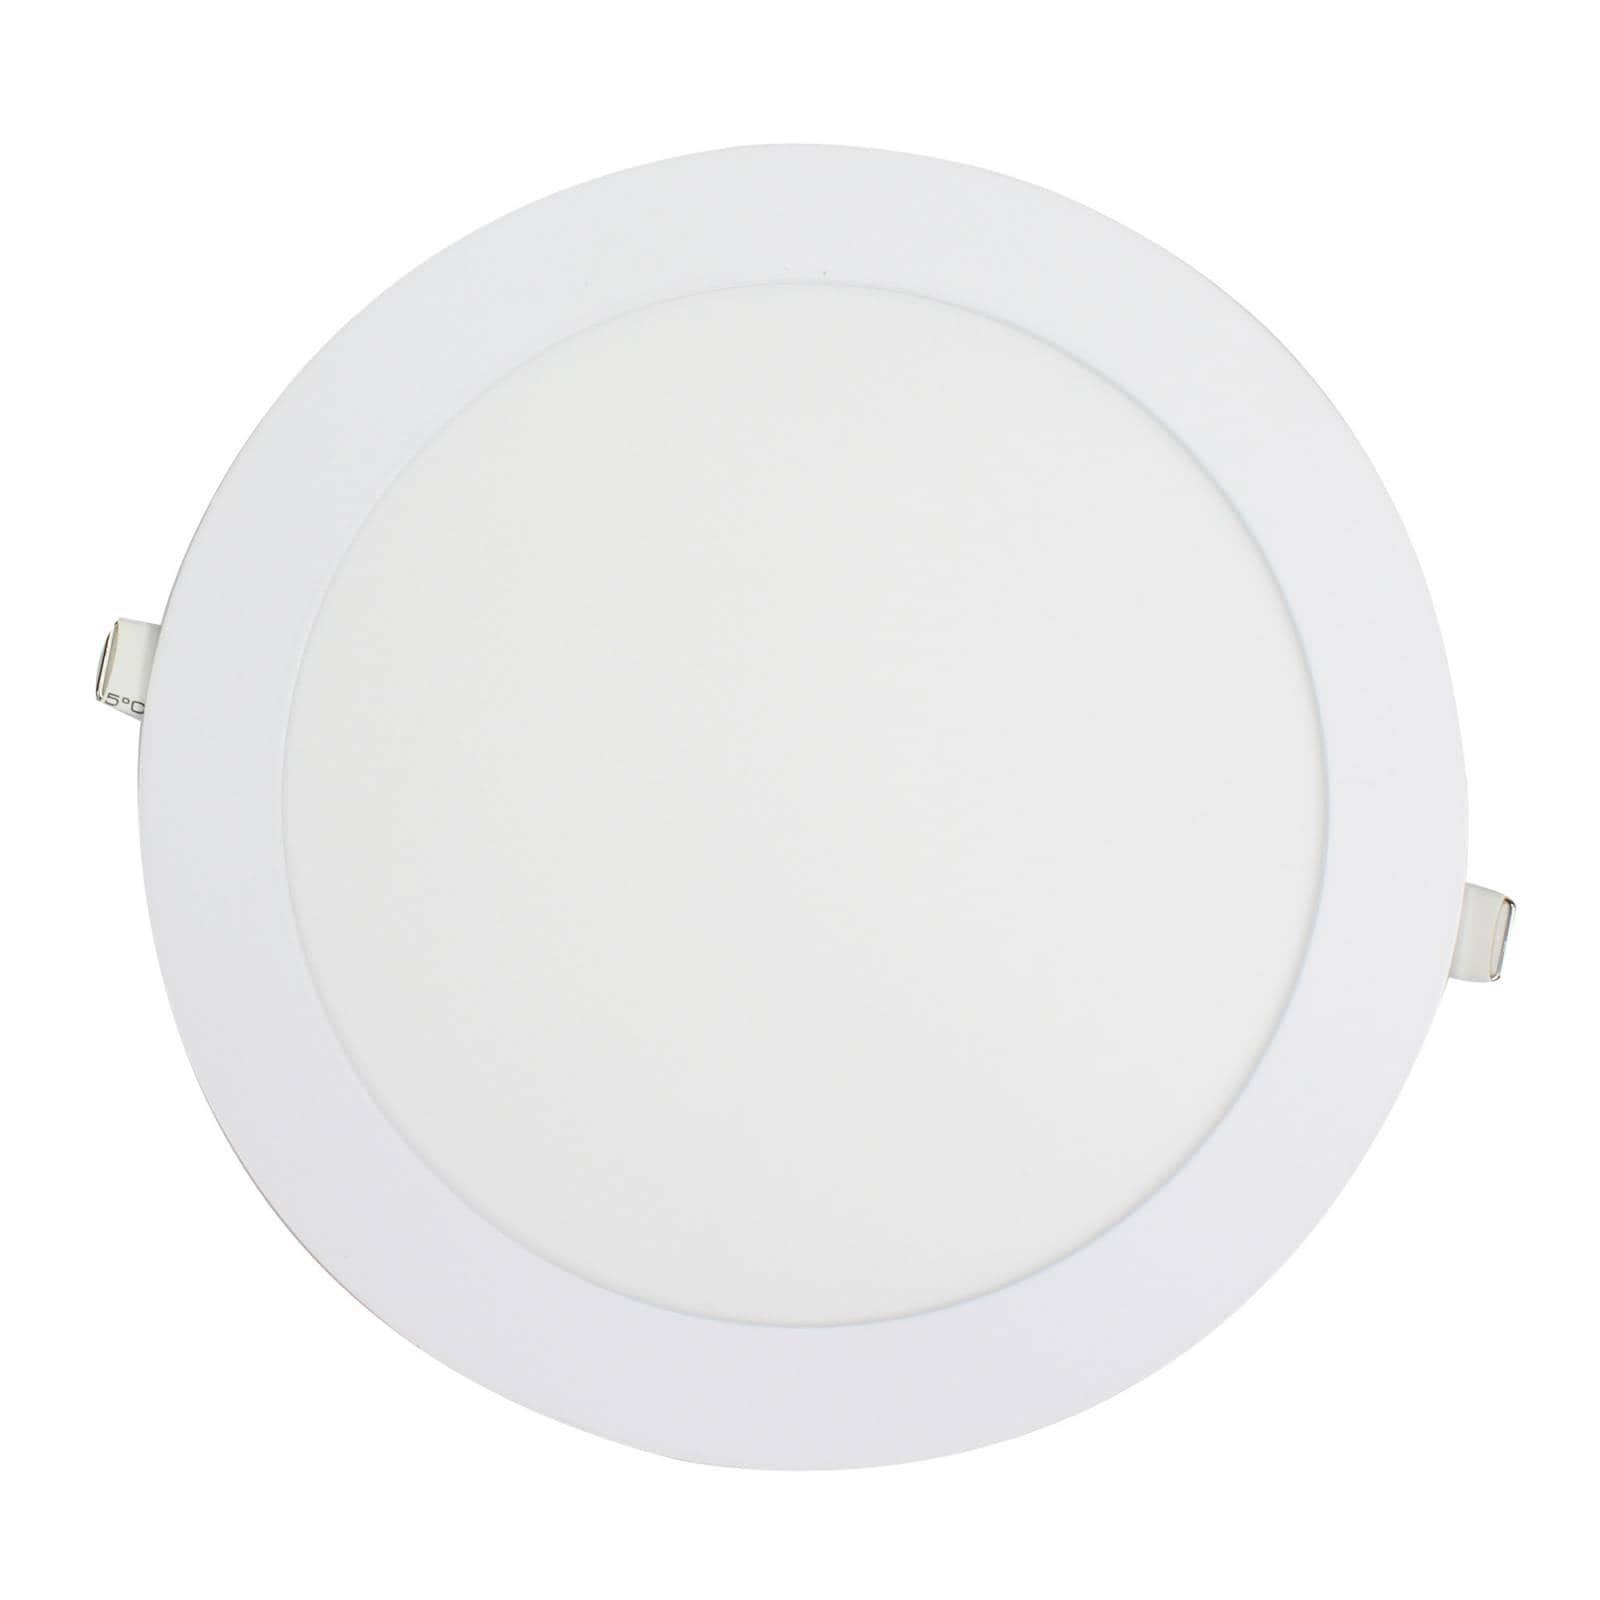 Lámpara Circular para Empotrar 18w Luz Fria Sanelec 1257